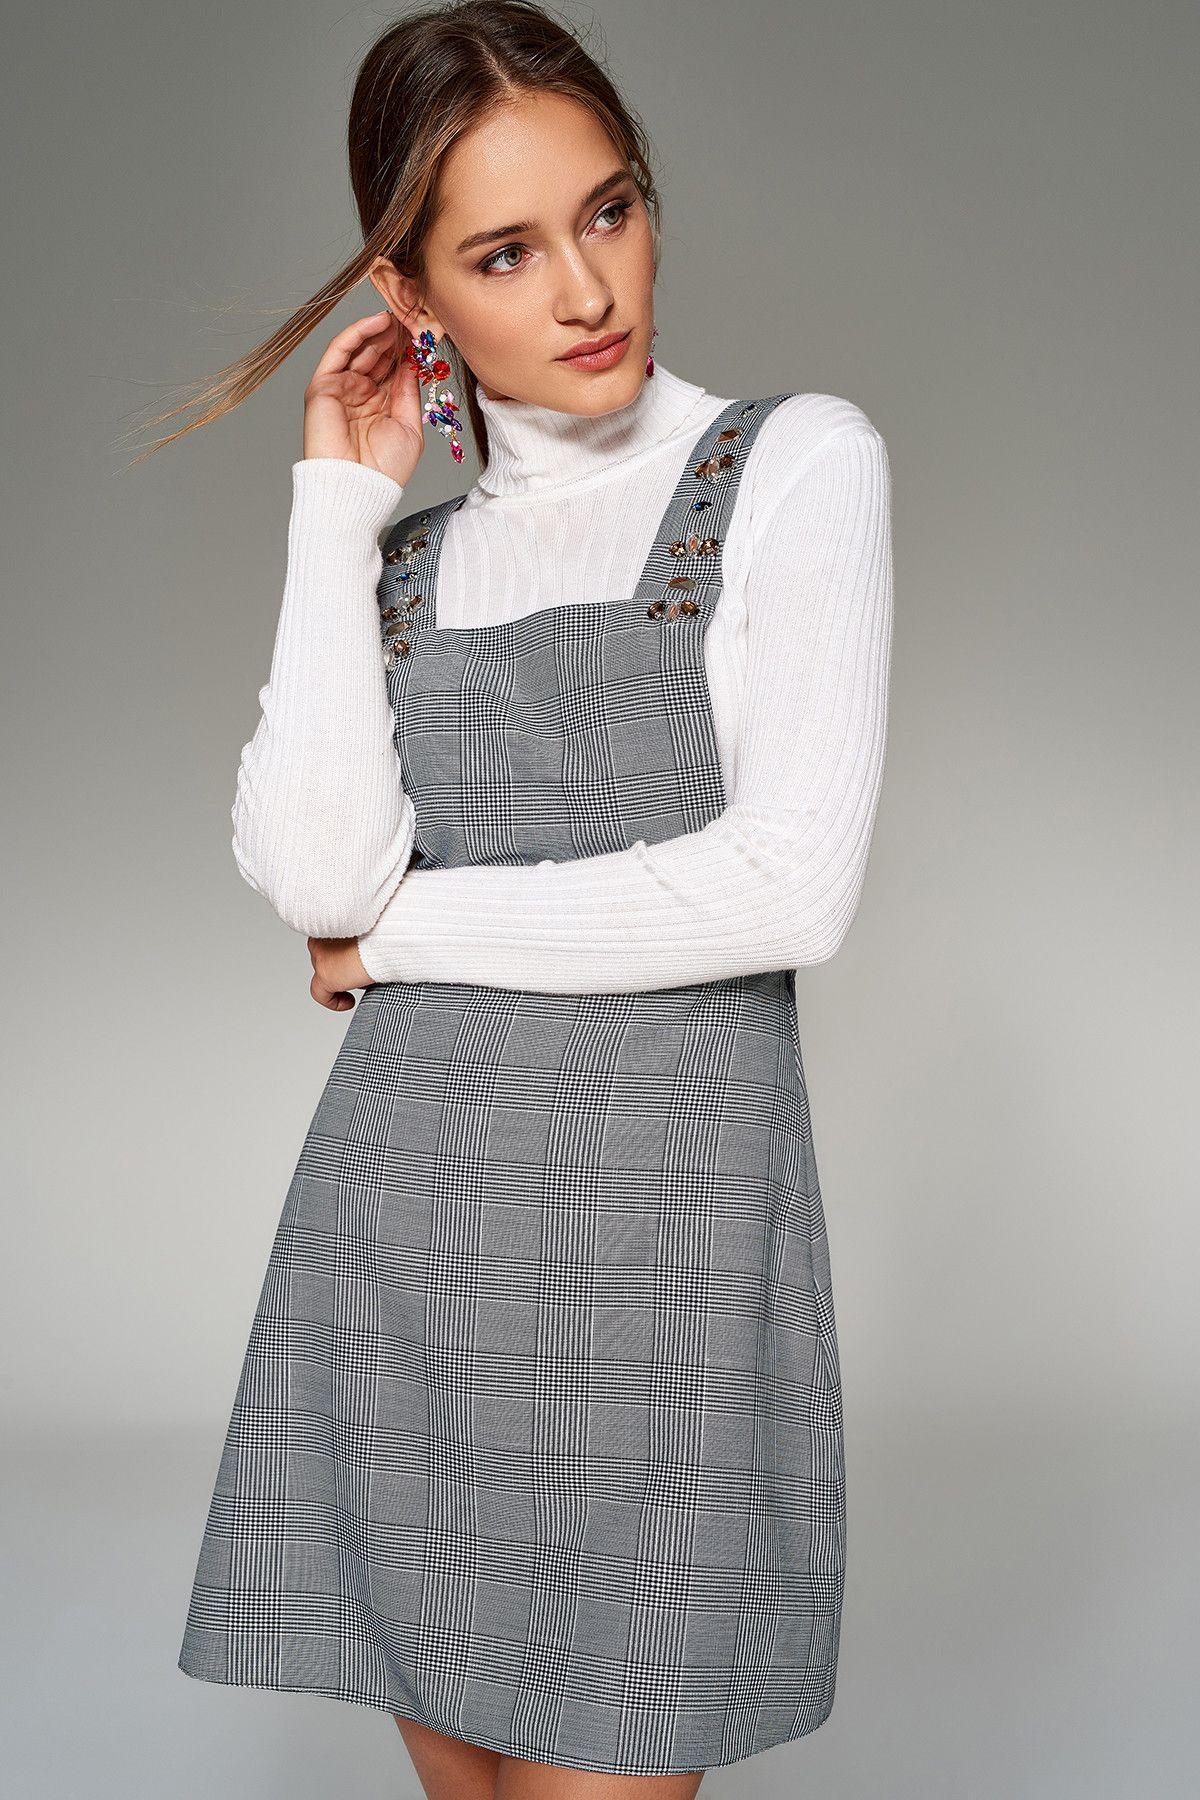 Gri Tas Detayli Ekose Elbise Trendyolmilla Trendyol Kiyafet Ekose Elbise